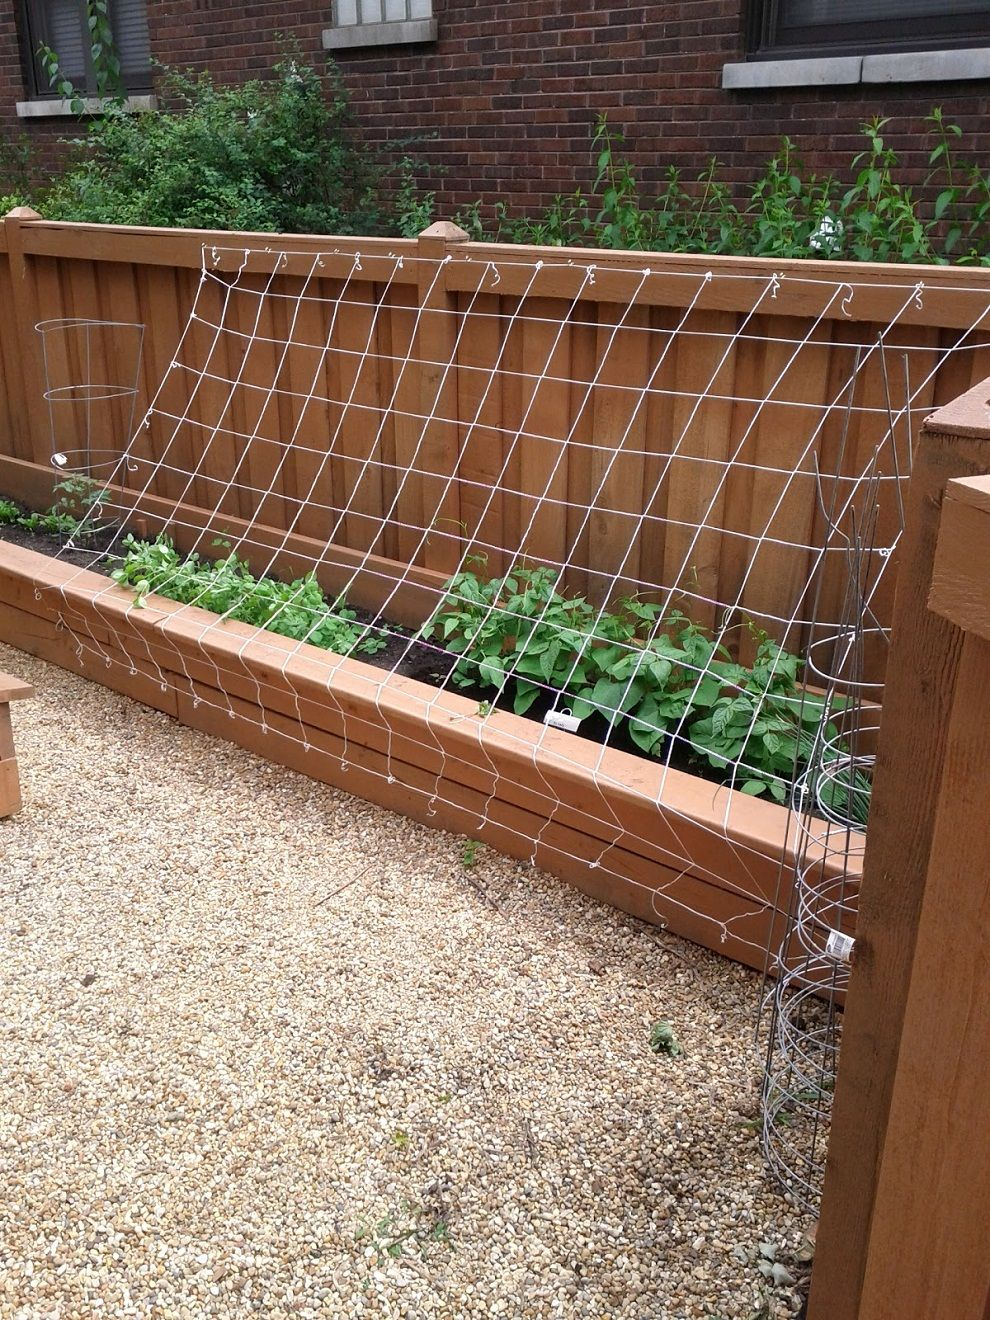 Green Bean Trellis Ideas Part - 31: Green Bean Trellis Designs